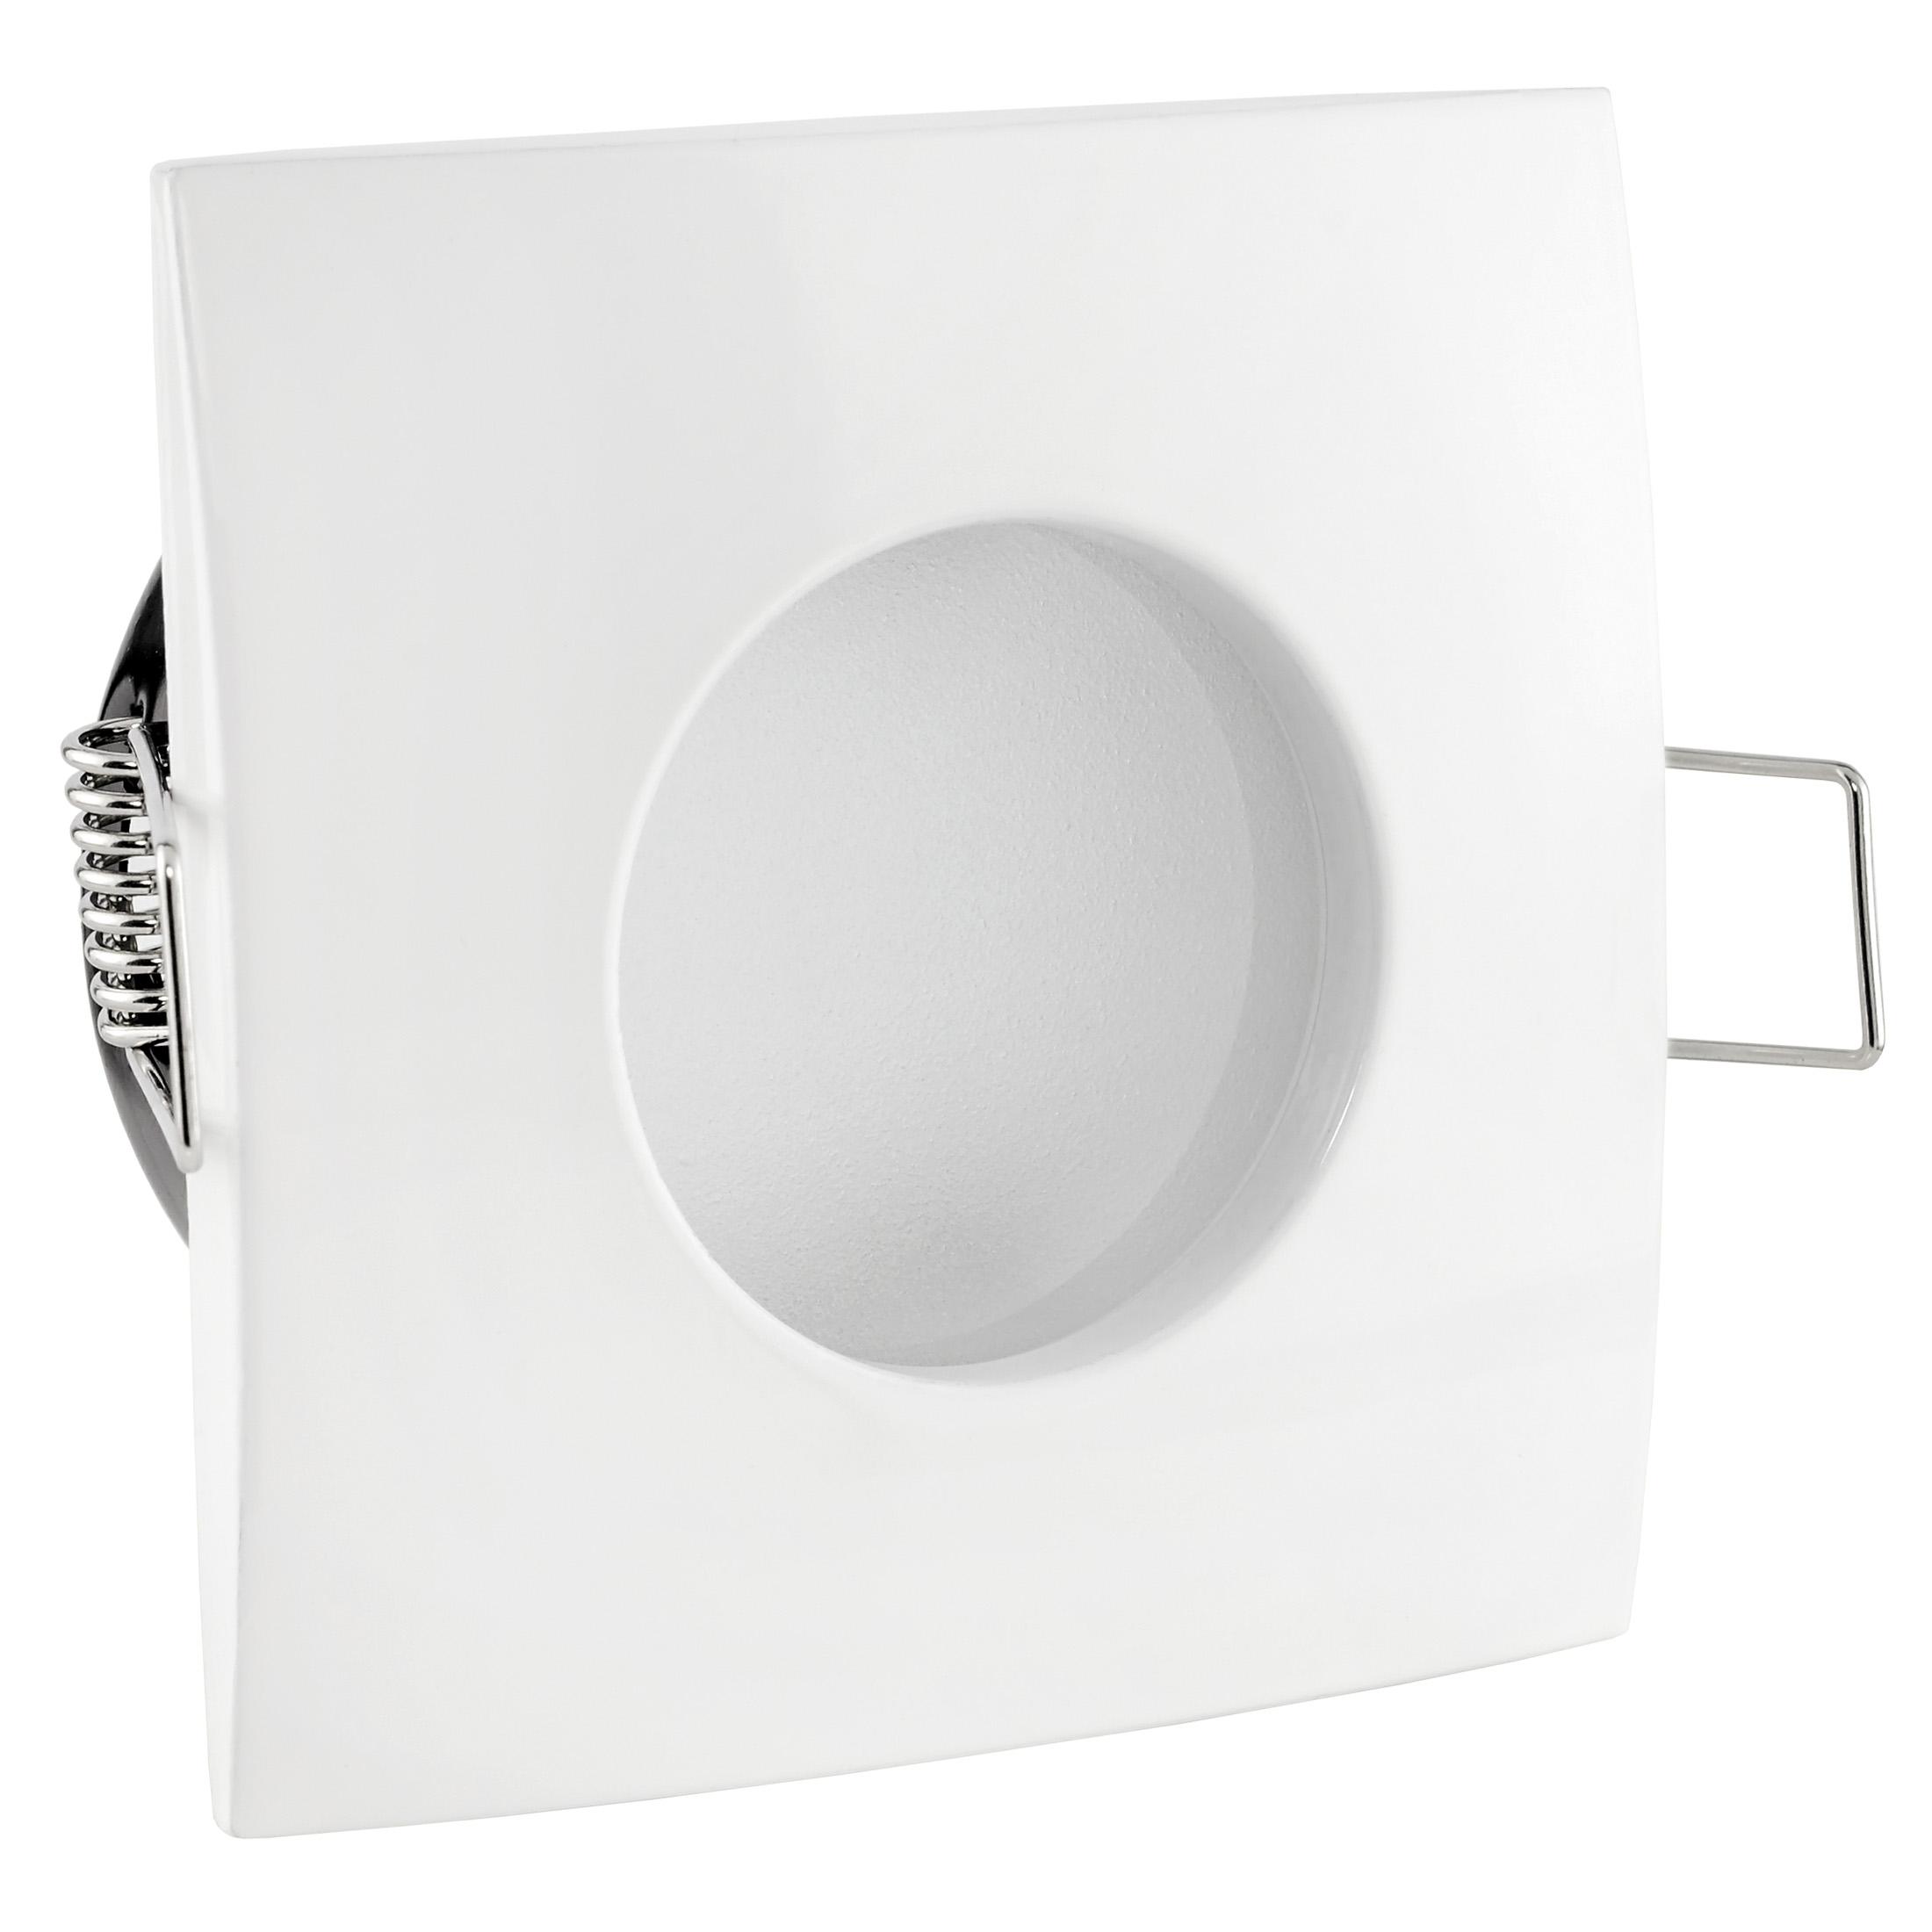 qw 1 led einbaustrahler weiss bad dusche feuchtraum ip65 4 9w warmwei dimmbar gu10 master. Black Bedroom Furniture Sets. Home Design Ideas